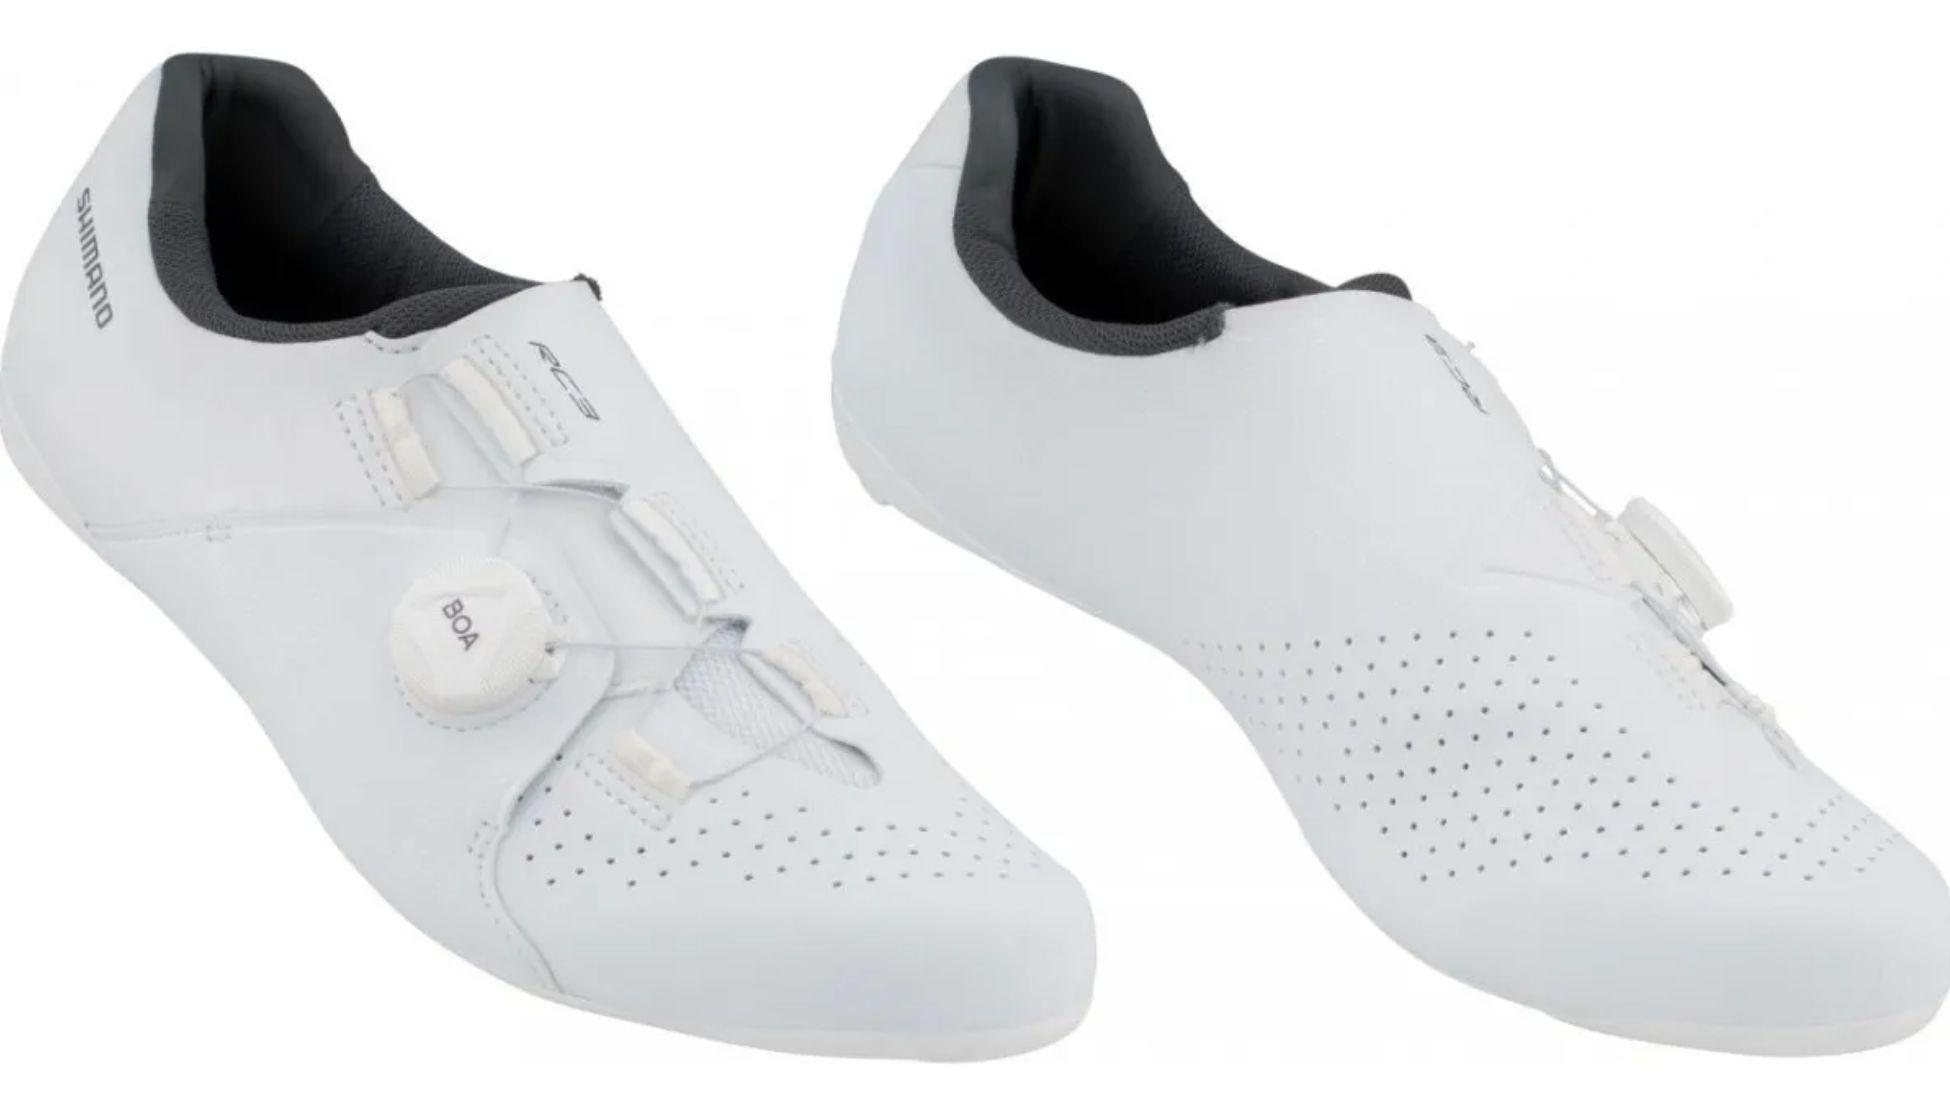 Sapatilha Shimano Sh-rc300 Rc3 Sistema Boa Pedal Clip Speed